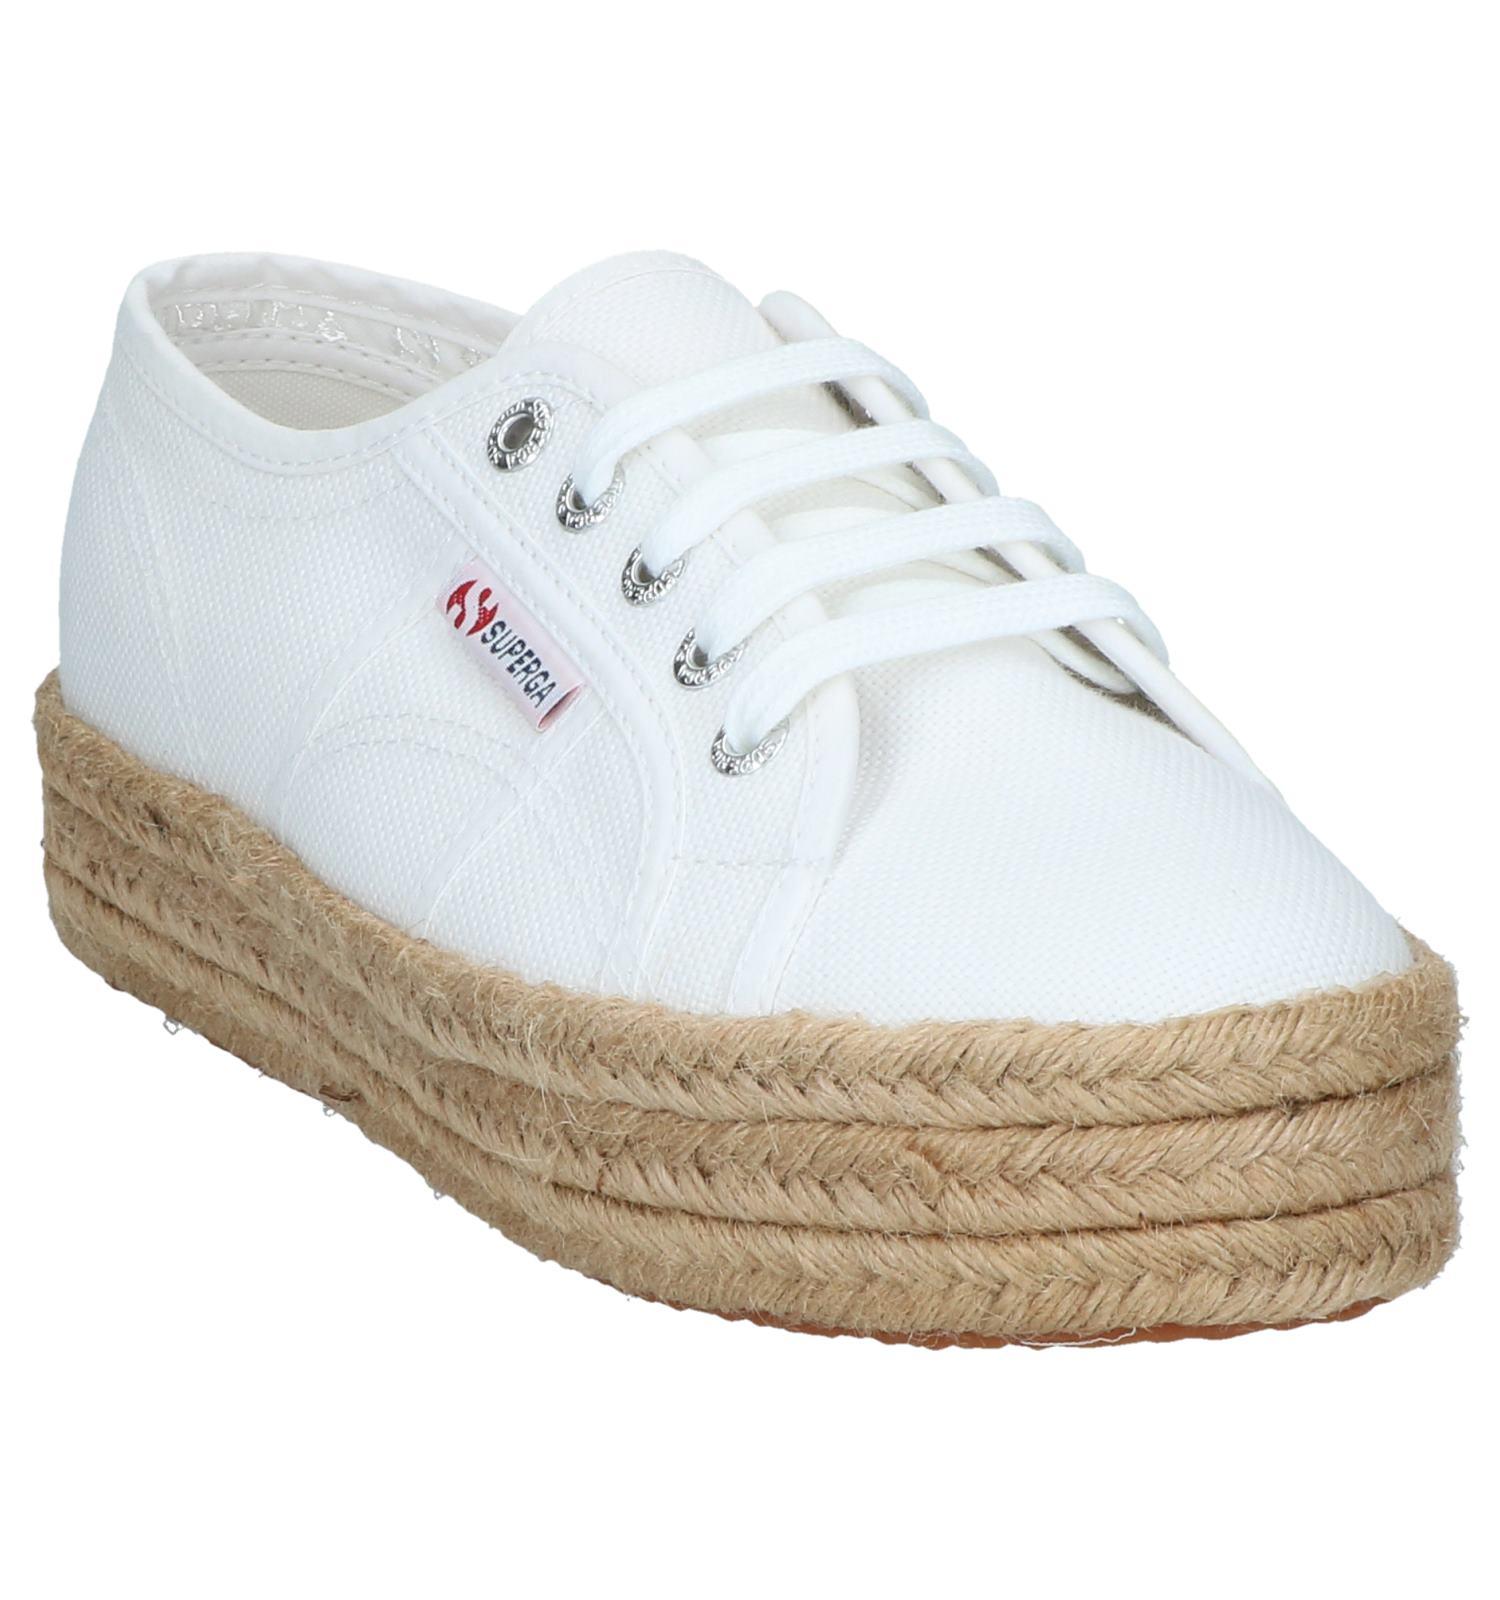 Supera Witte Lage Lage Lage Sneakers Witte Sneakers Witte Supera Supera Sneakers OXZuPiTwk